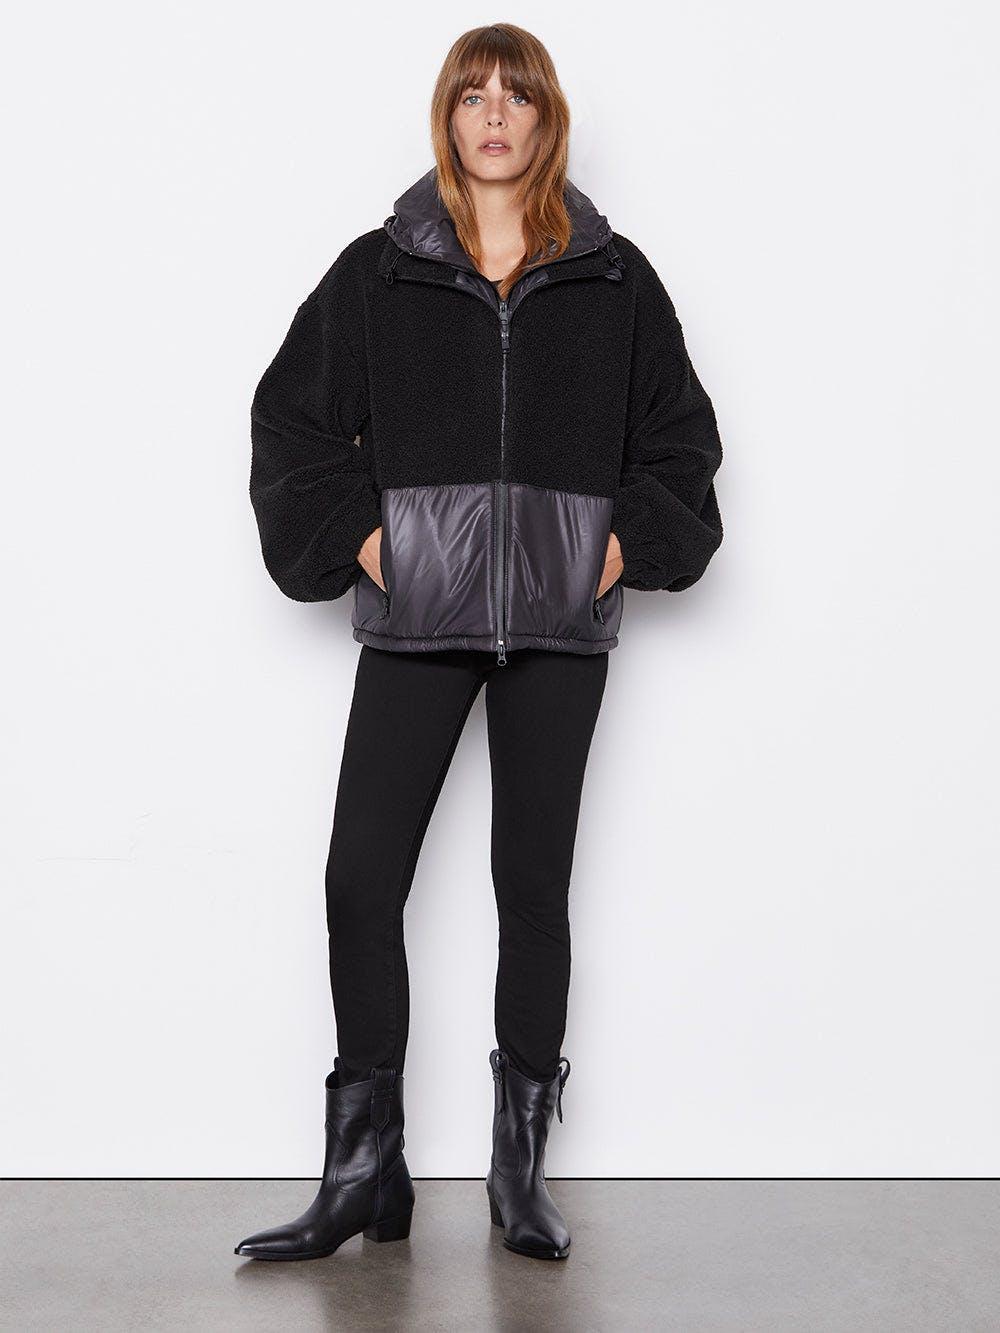 jacket full body view alt:hover